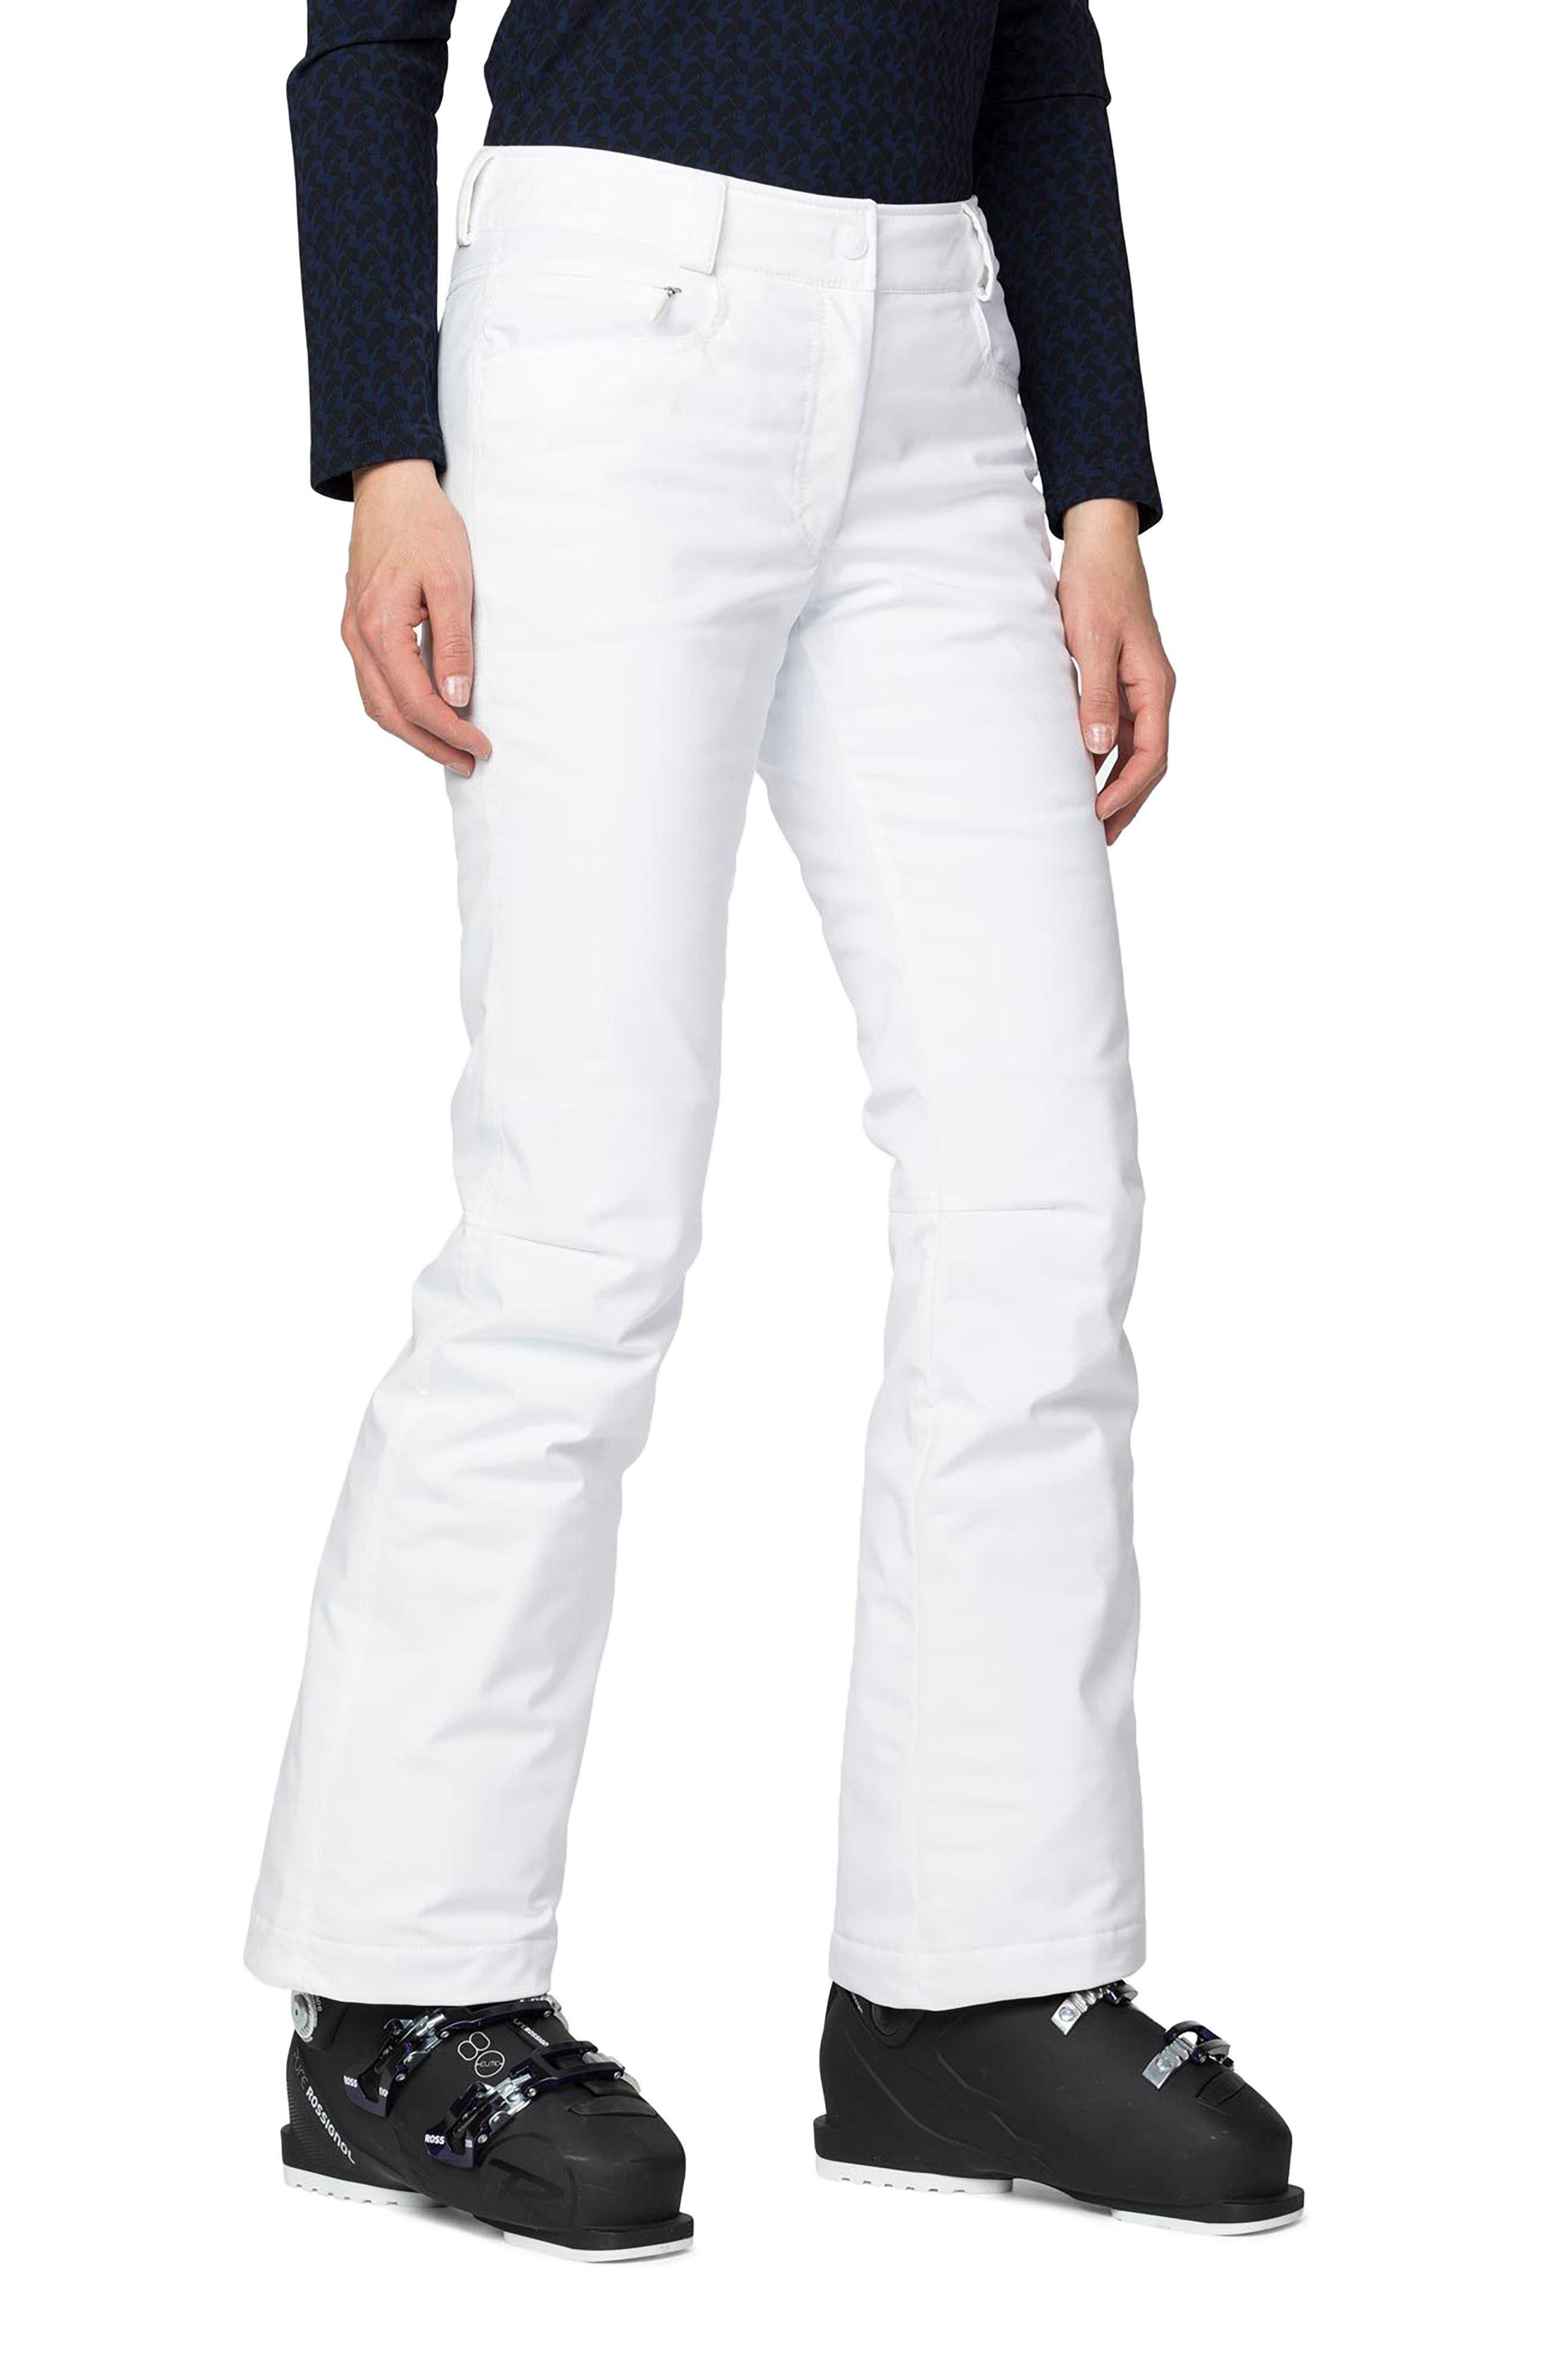 Rossignol Palmares Ski Pants, White